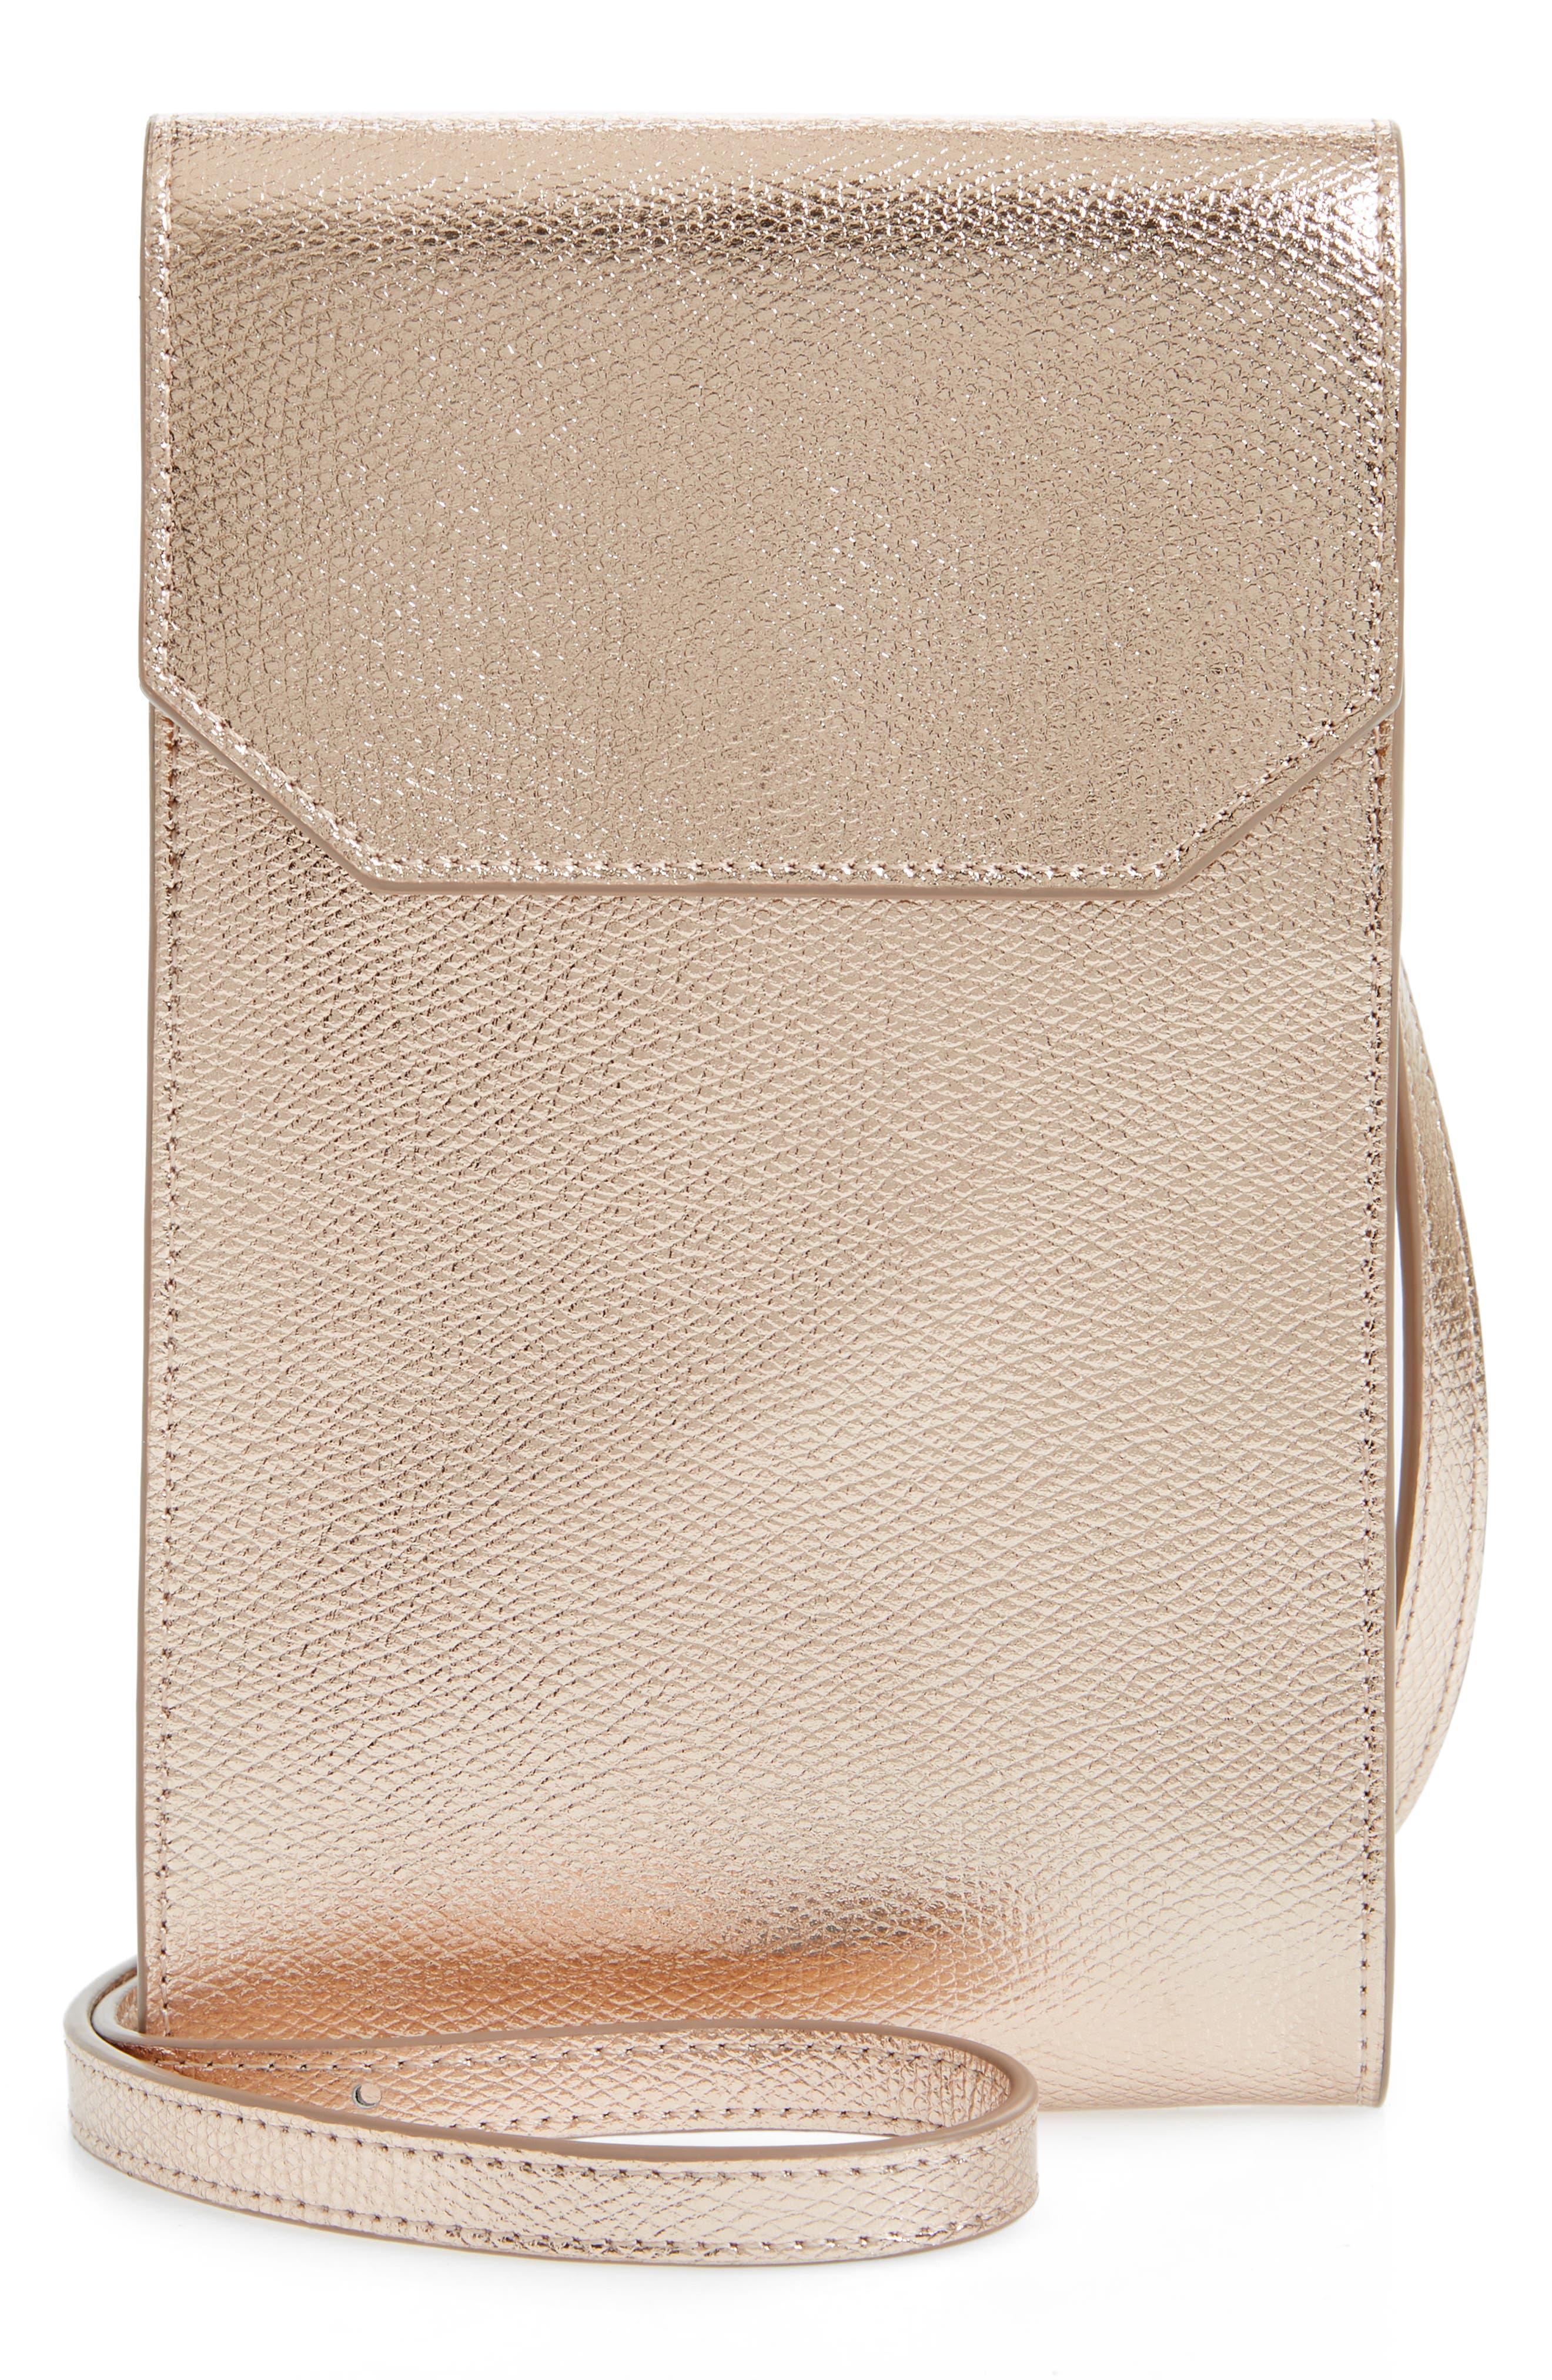 Metallic Leather Phone Crossbody Bag,                             Main thumbnail 1, color,                             220